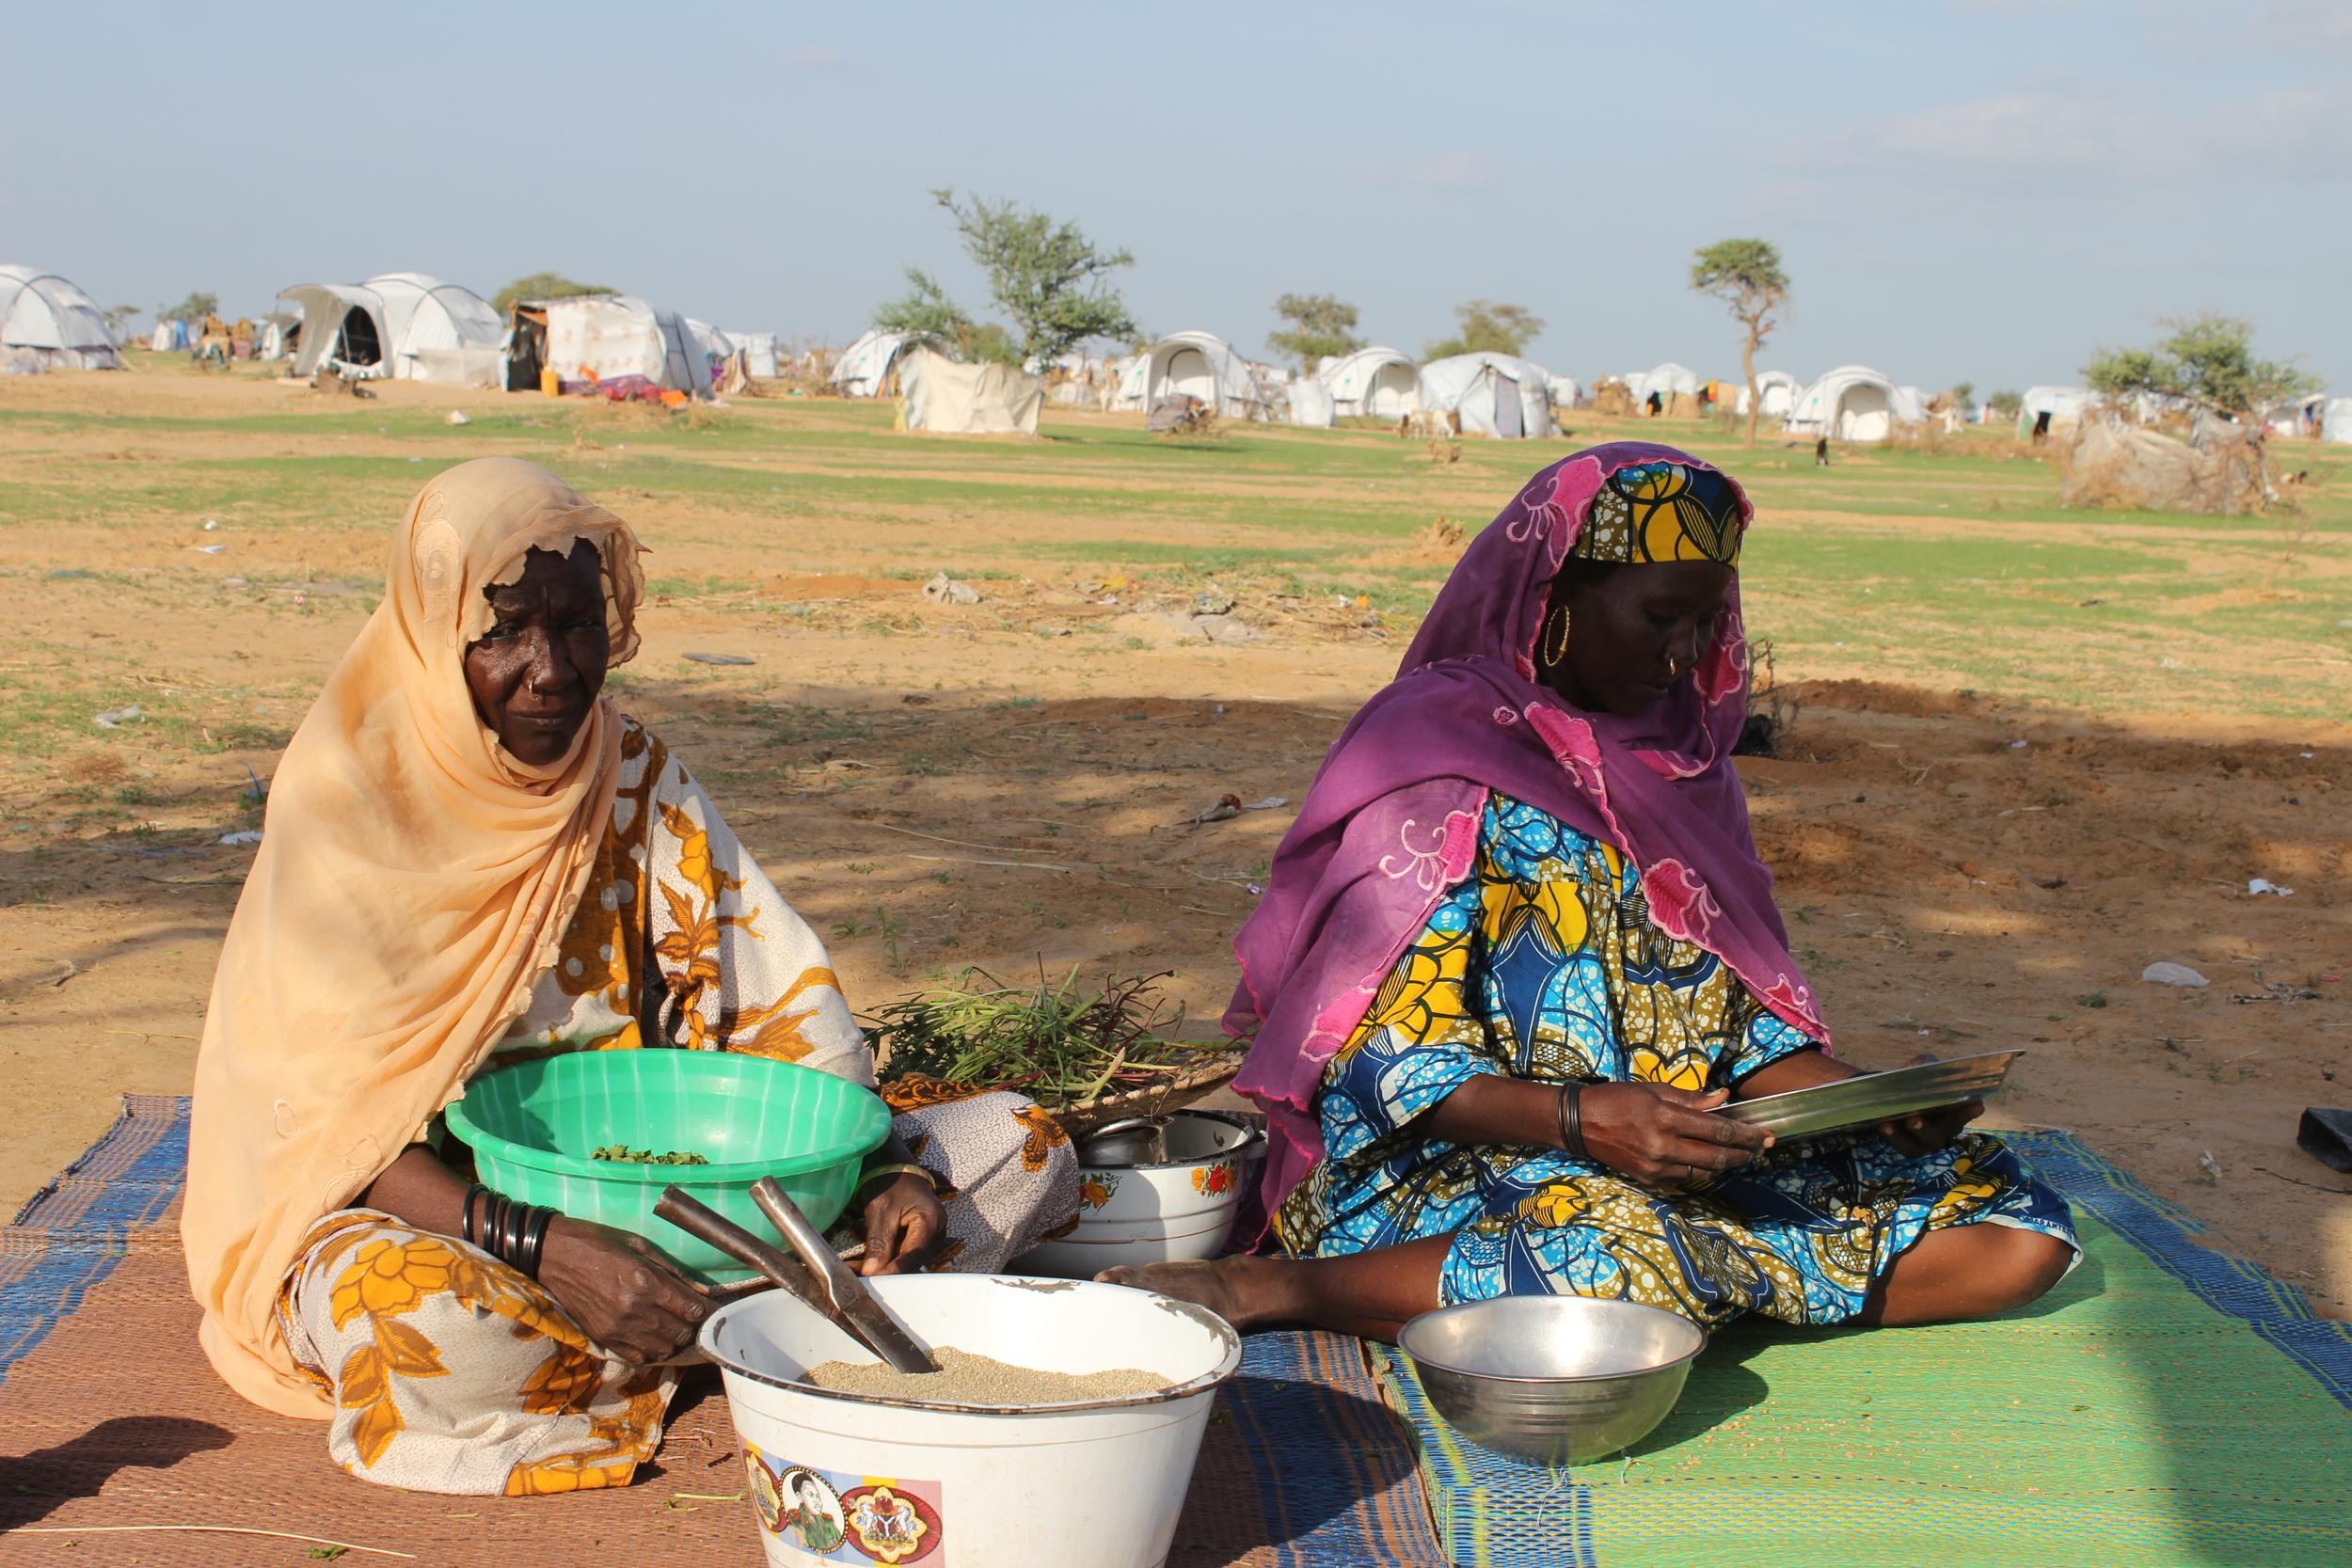 Nigerian refugees prepare millet outside a refugee camp in Niger's Diffa region (Boureima Balima)